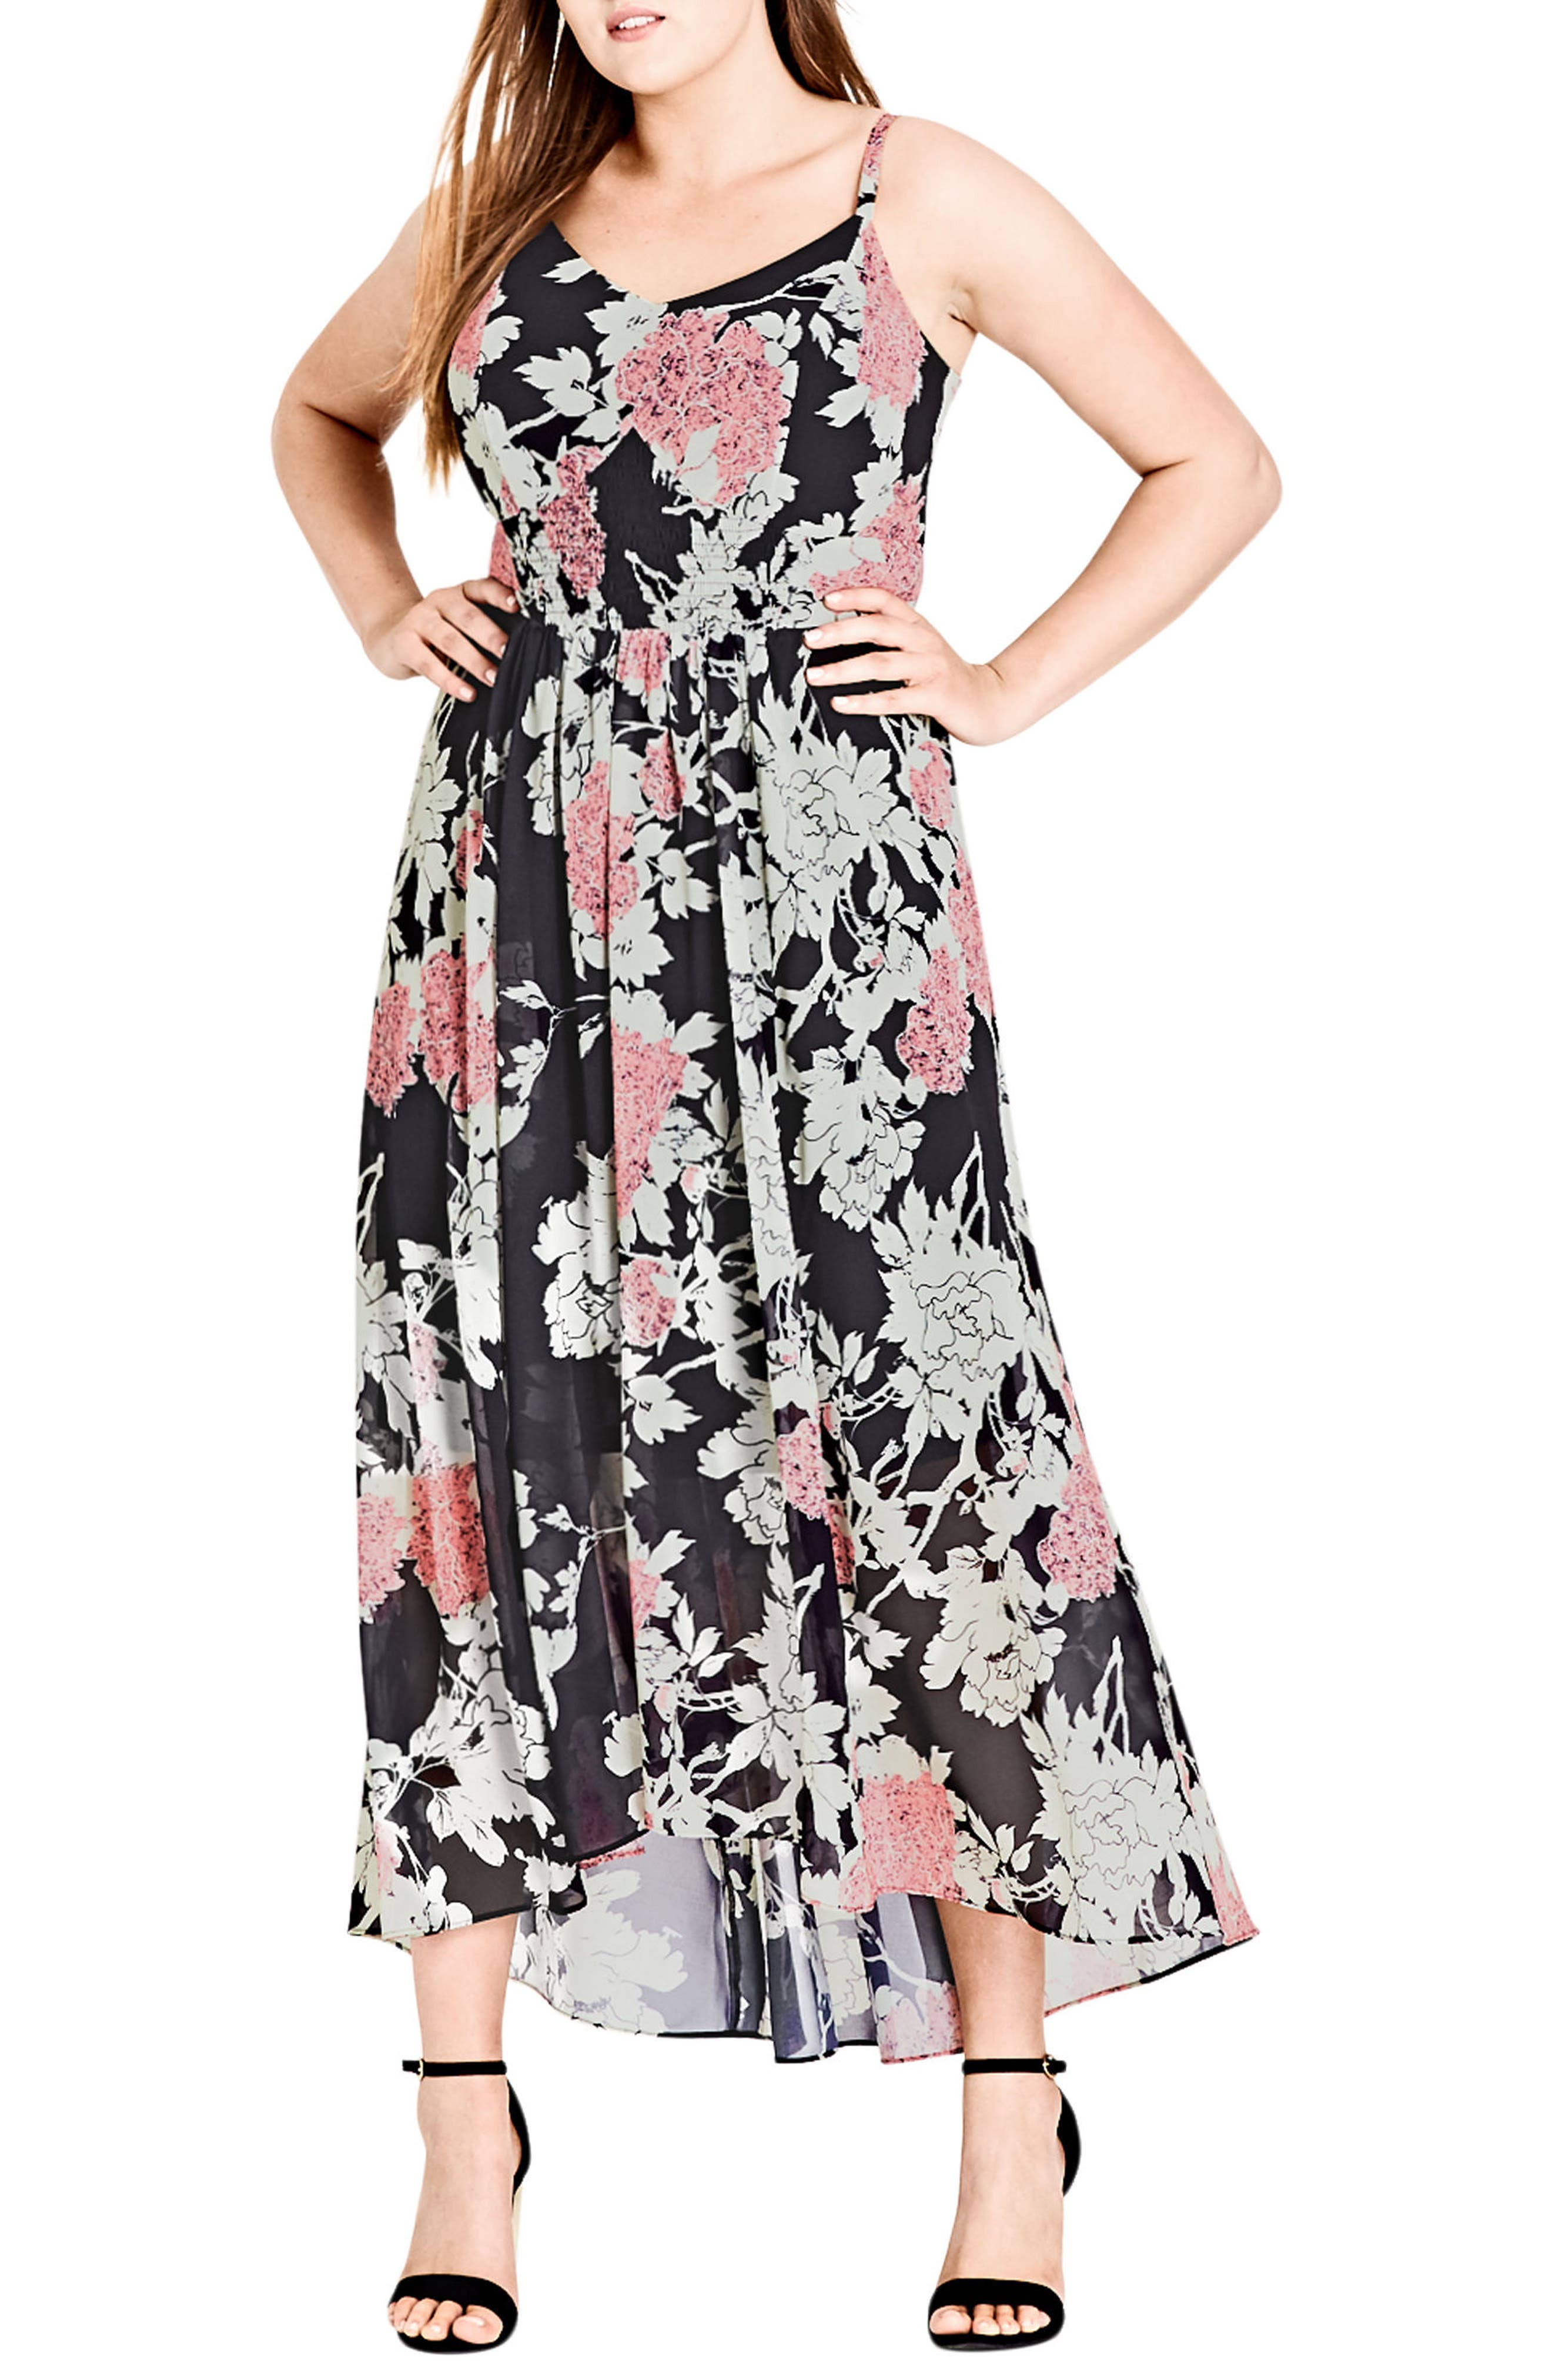 Alternate Image 1 Selected - City Chic Bonsai Floral Maxi Dress (Plus Size)